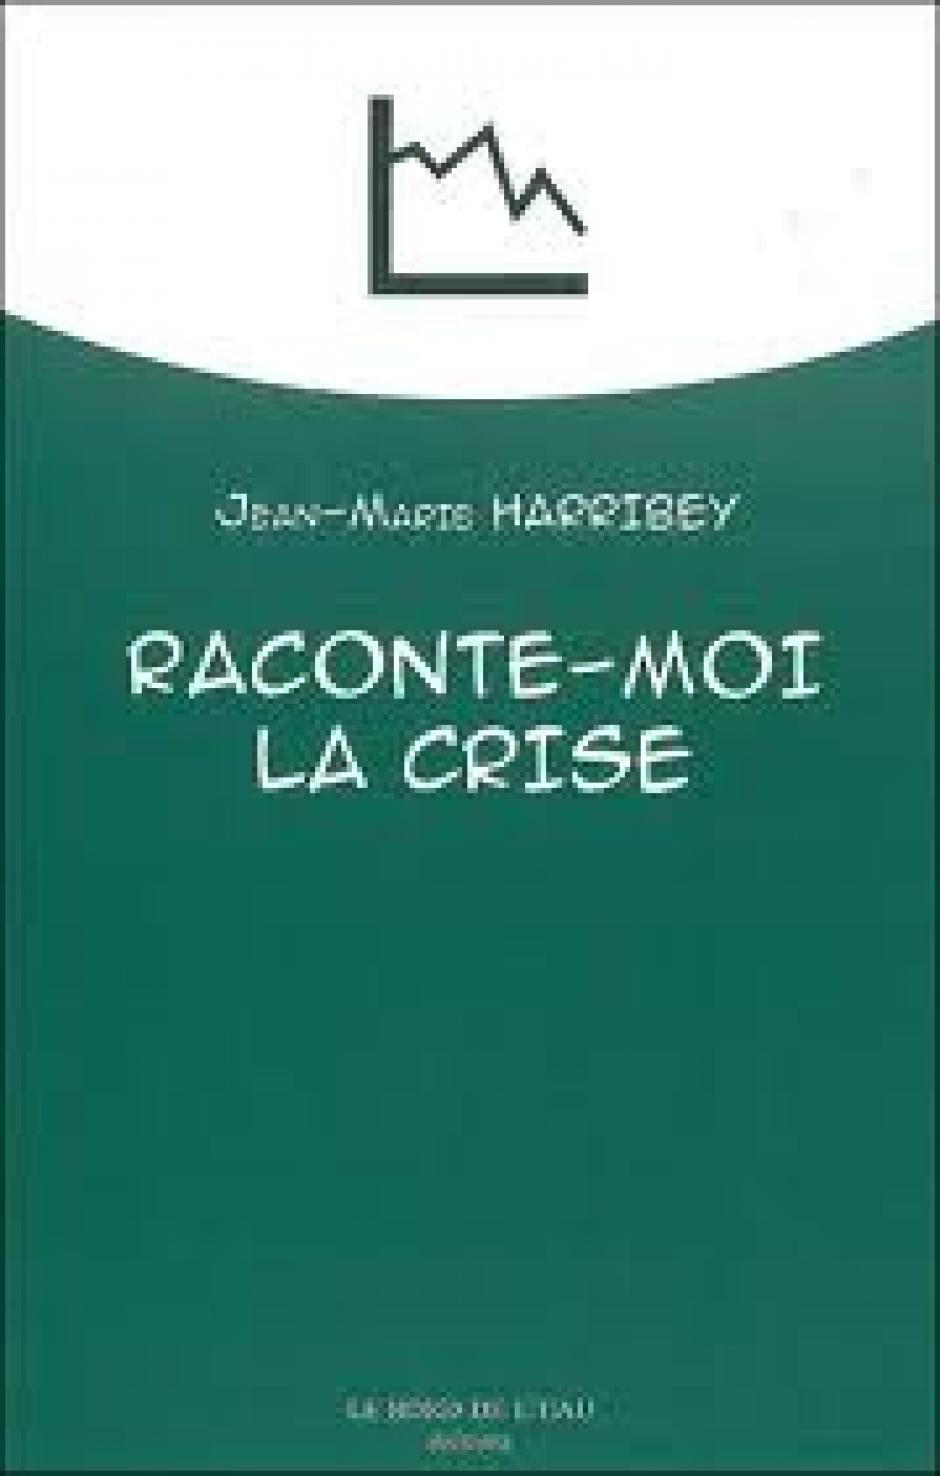 Ne pas se tromper de cible, Jean-Marie Harribey*